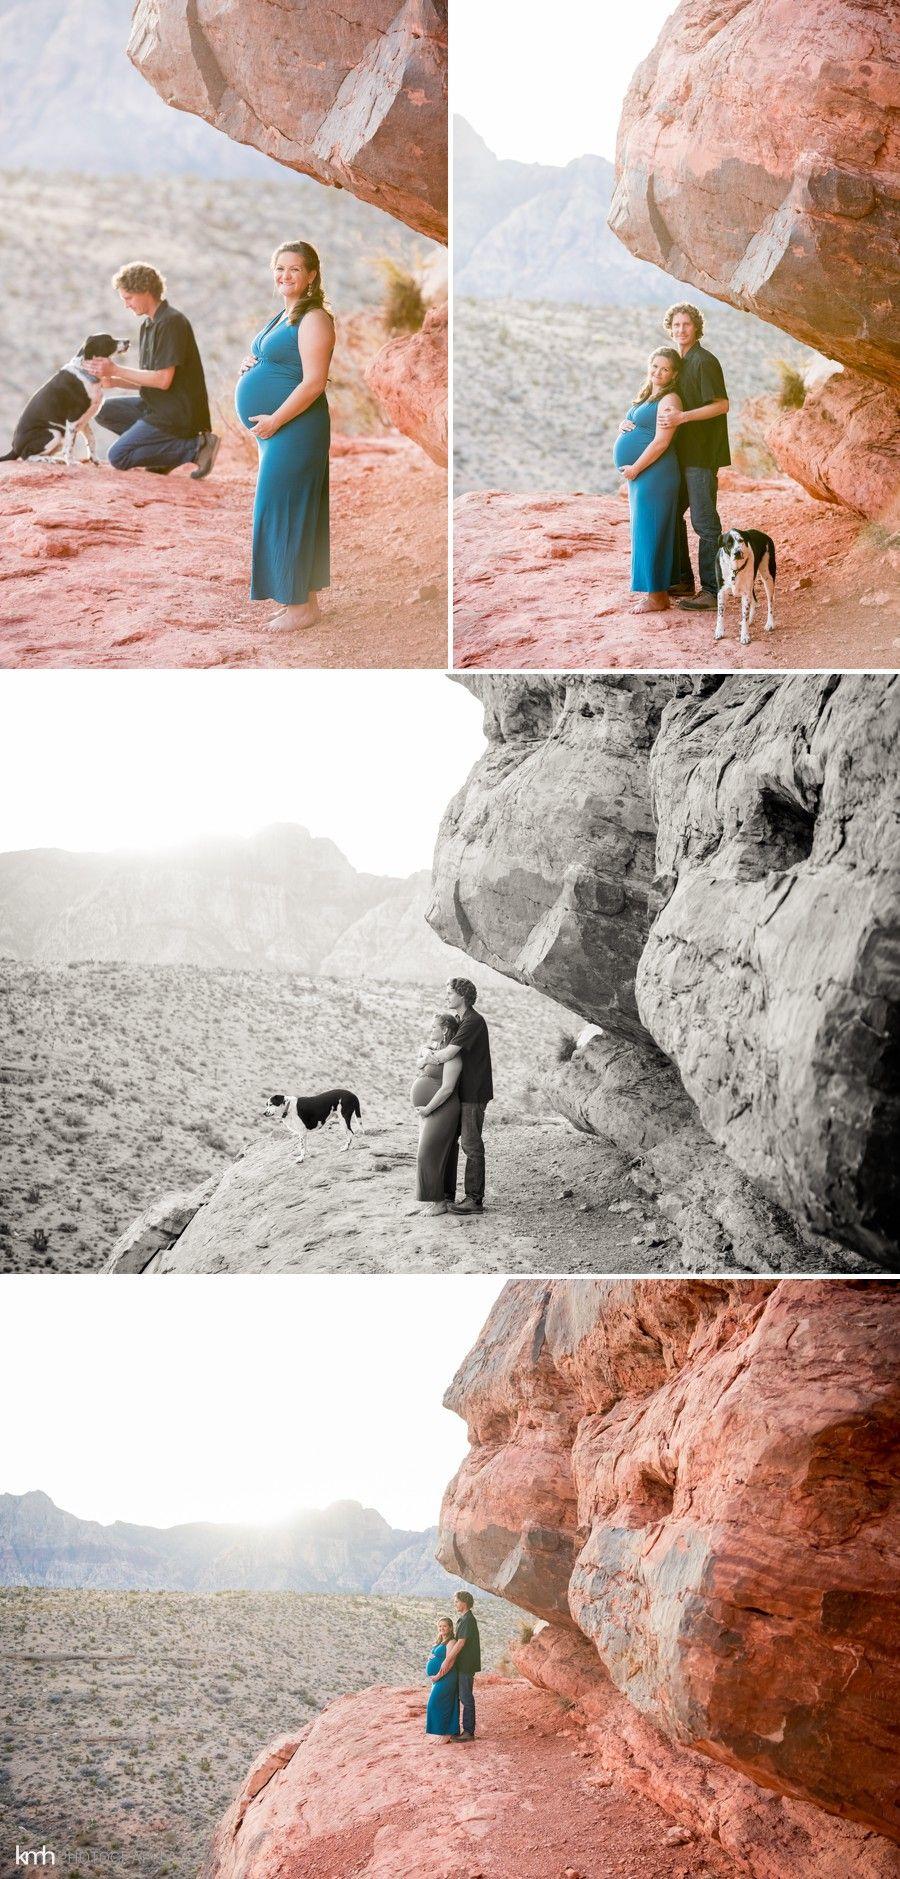 Desert Maternity Session | KMH Photography, Las Vegas Wedding Photographer